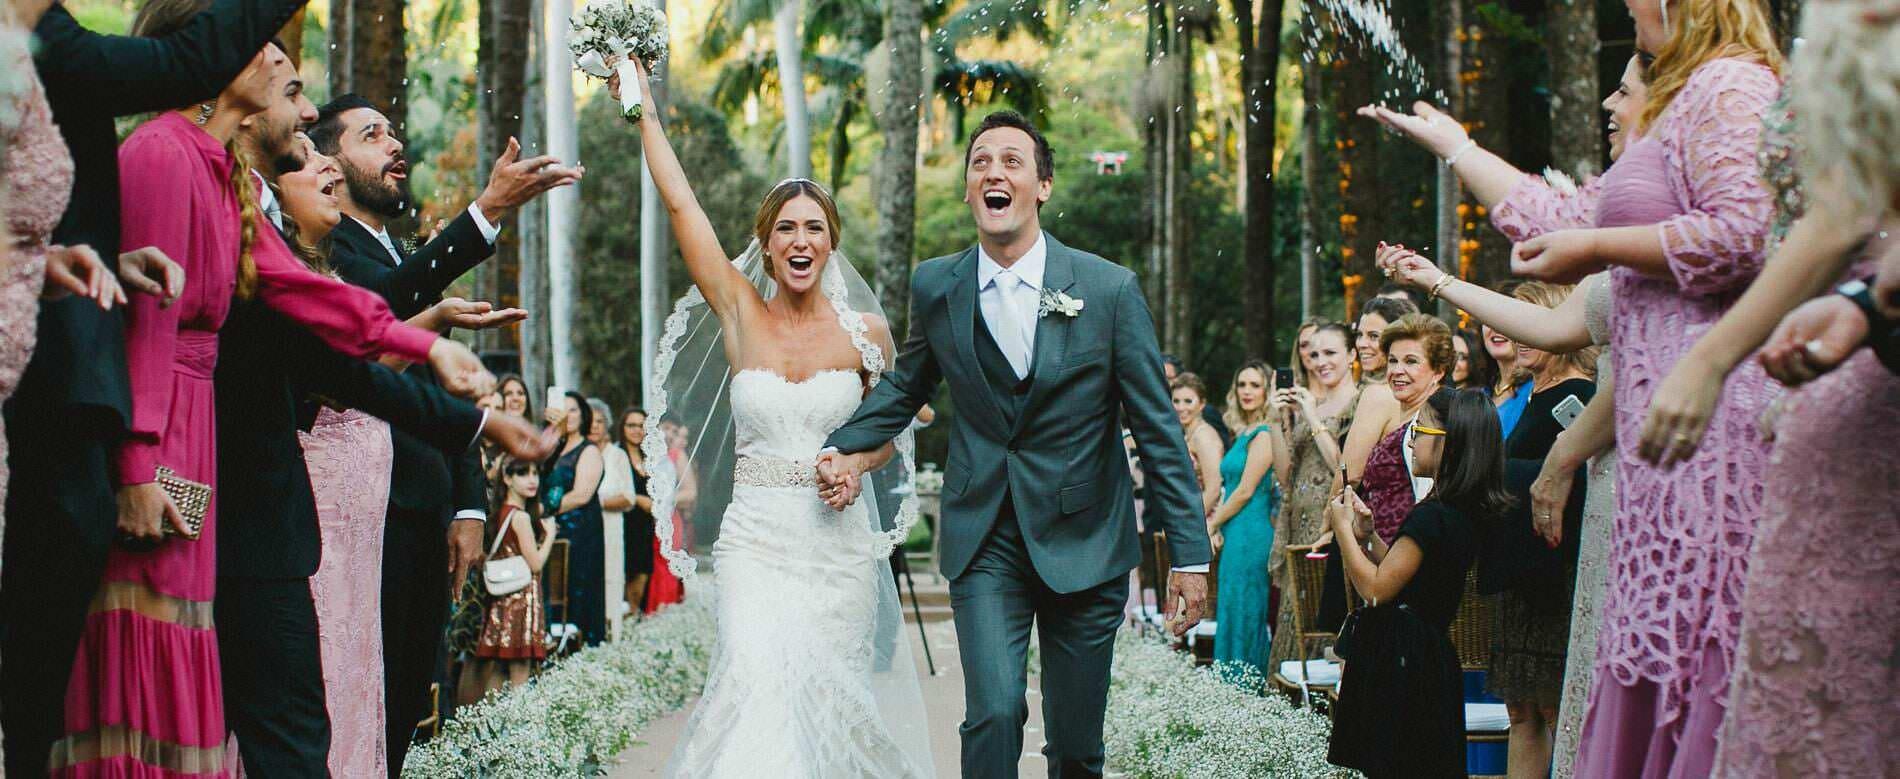 casamento no campo, fotógrafo de casamento